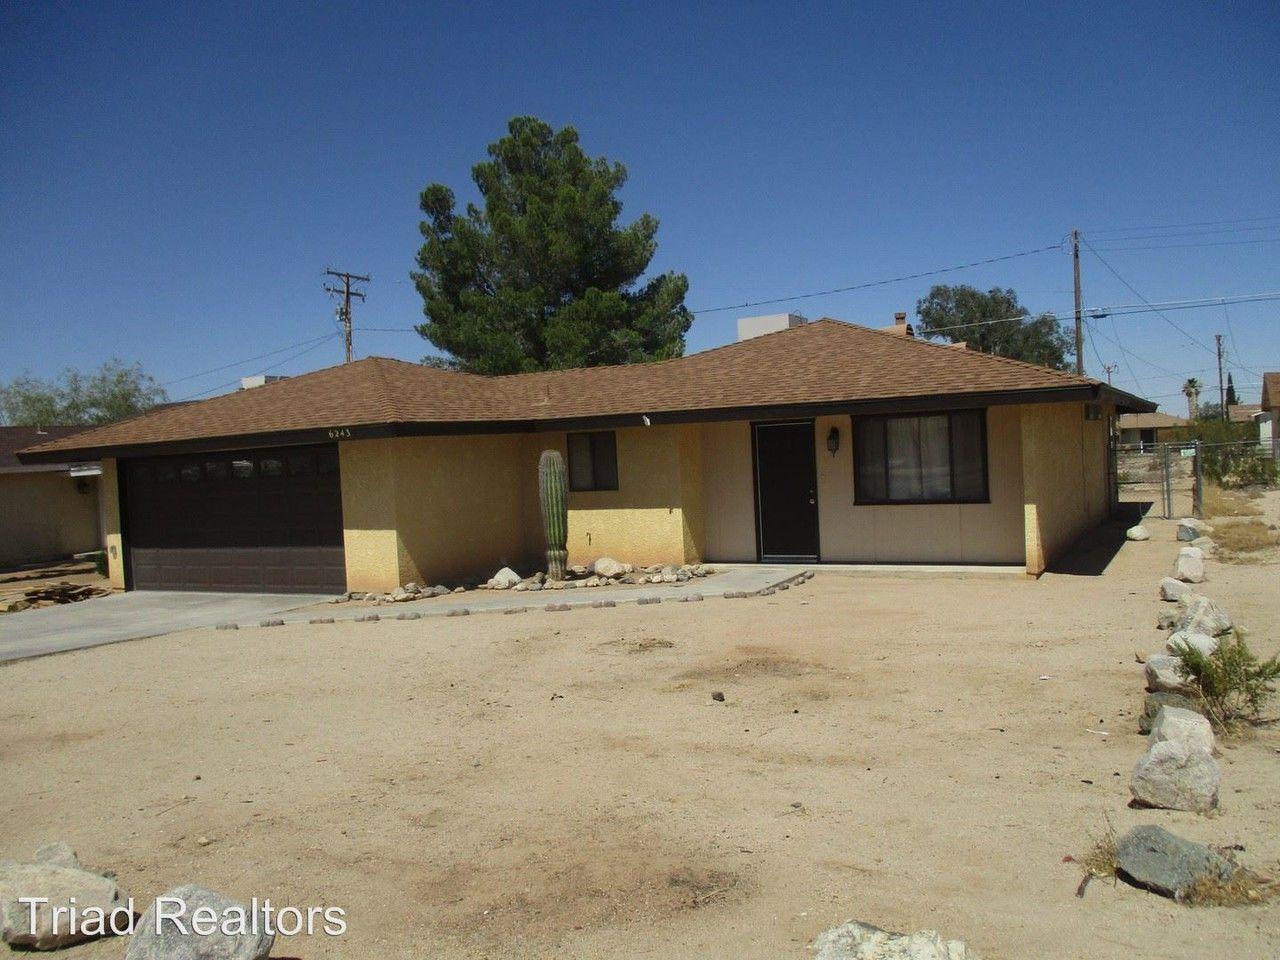 6243 Mojave Ave Twentynine Palms Ca 92277 3 Bedroom